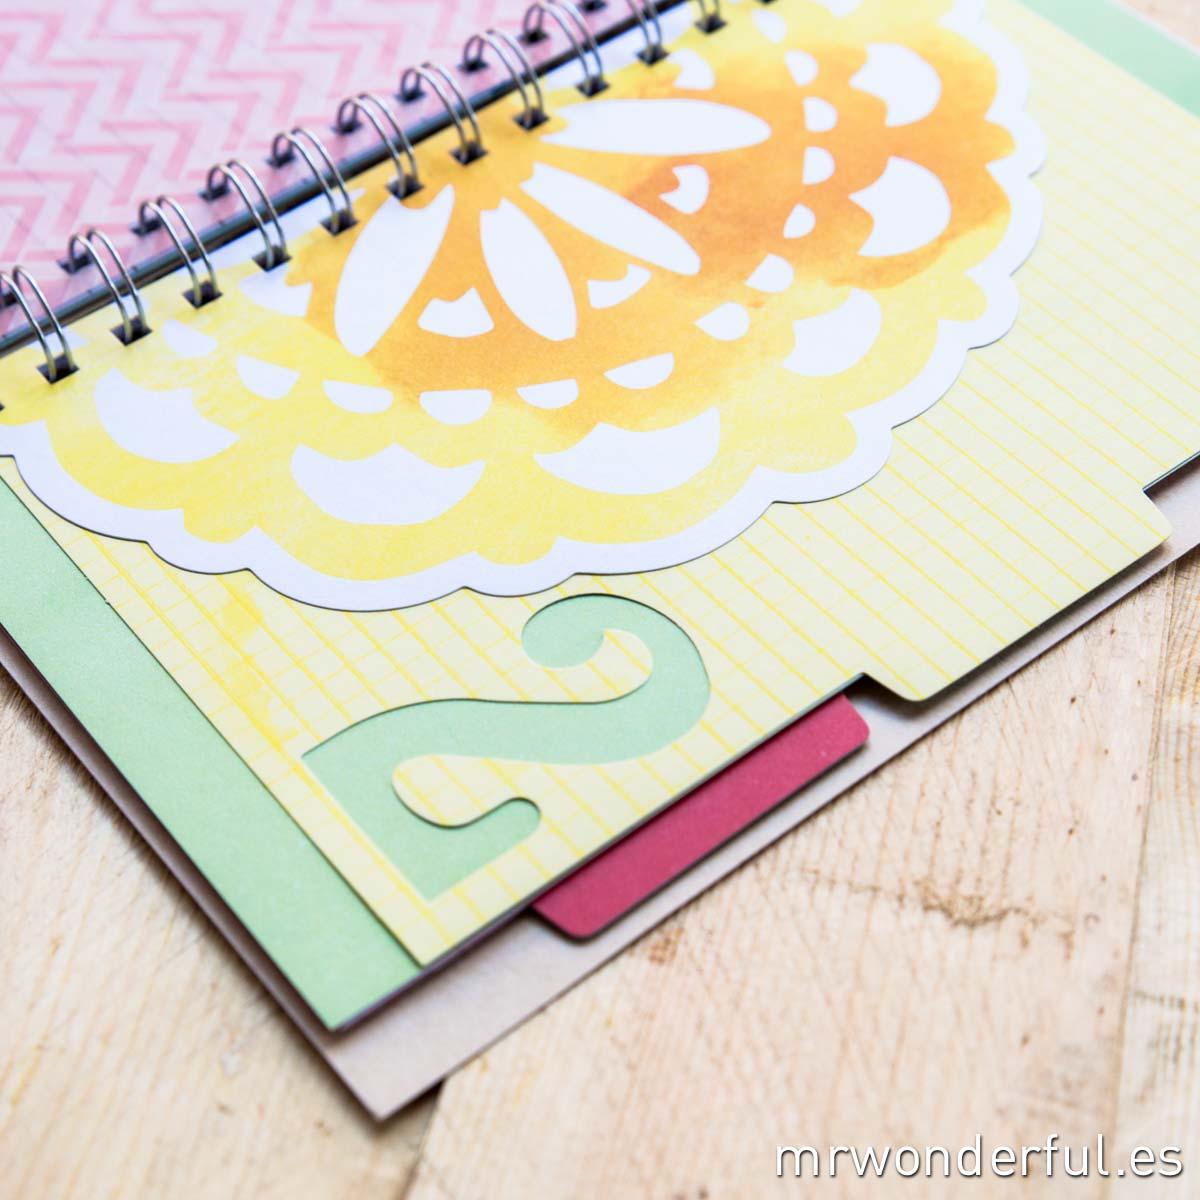 mrwonderfulshop_35957_album_con_aspiral_para_personalizar_day_book_04